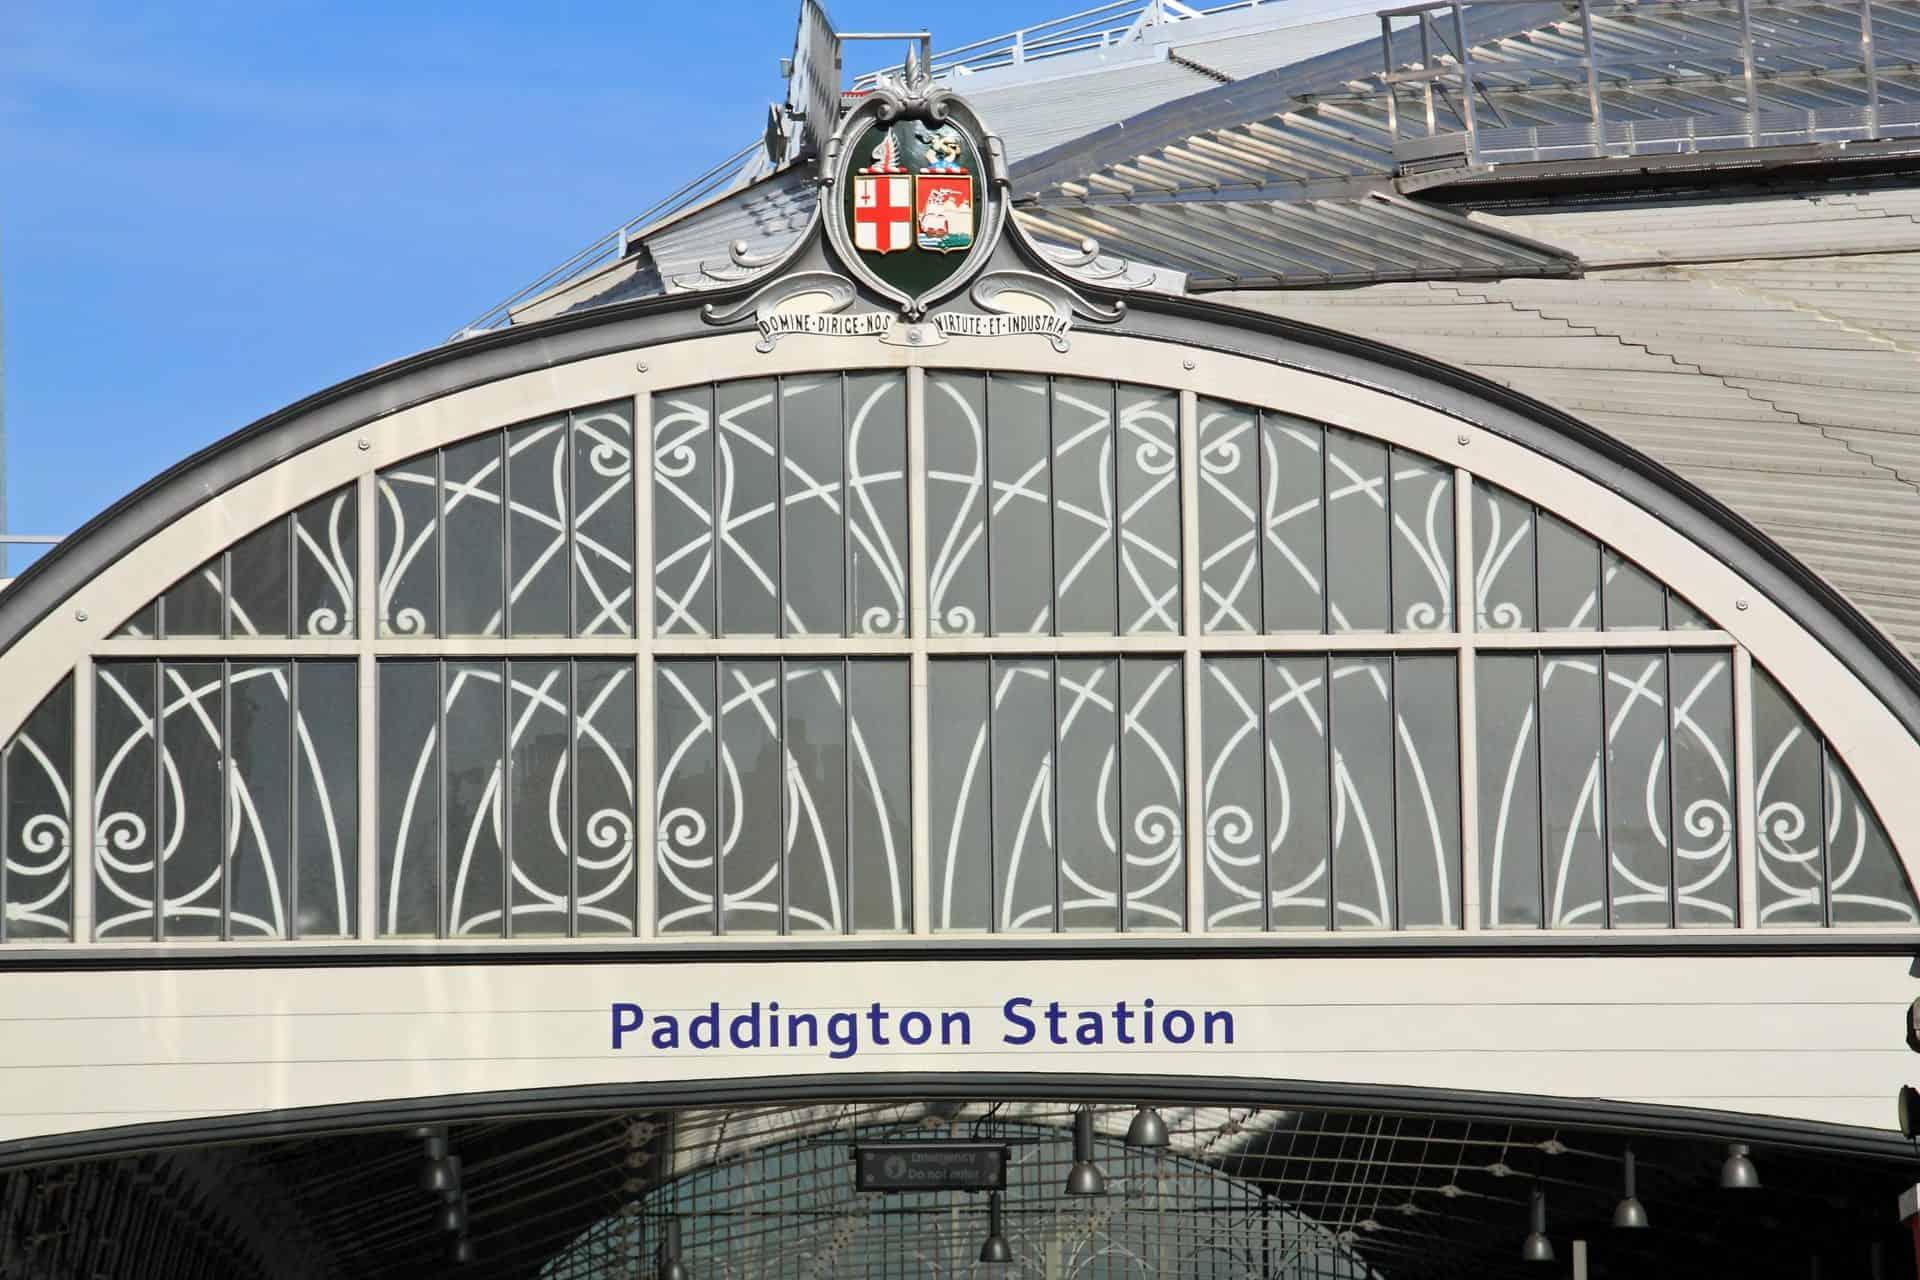 Paddington Station, London, England